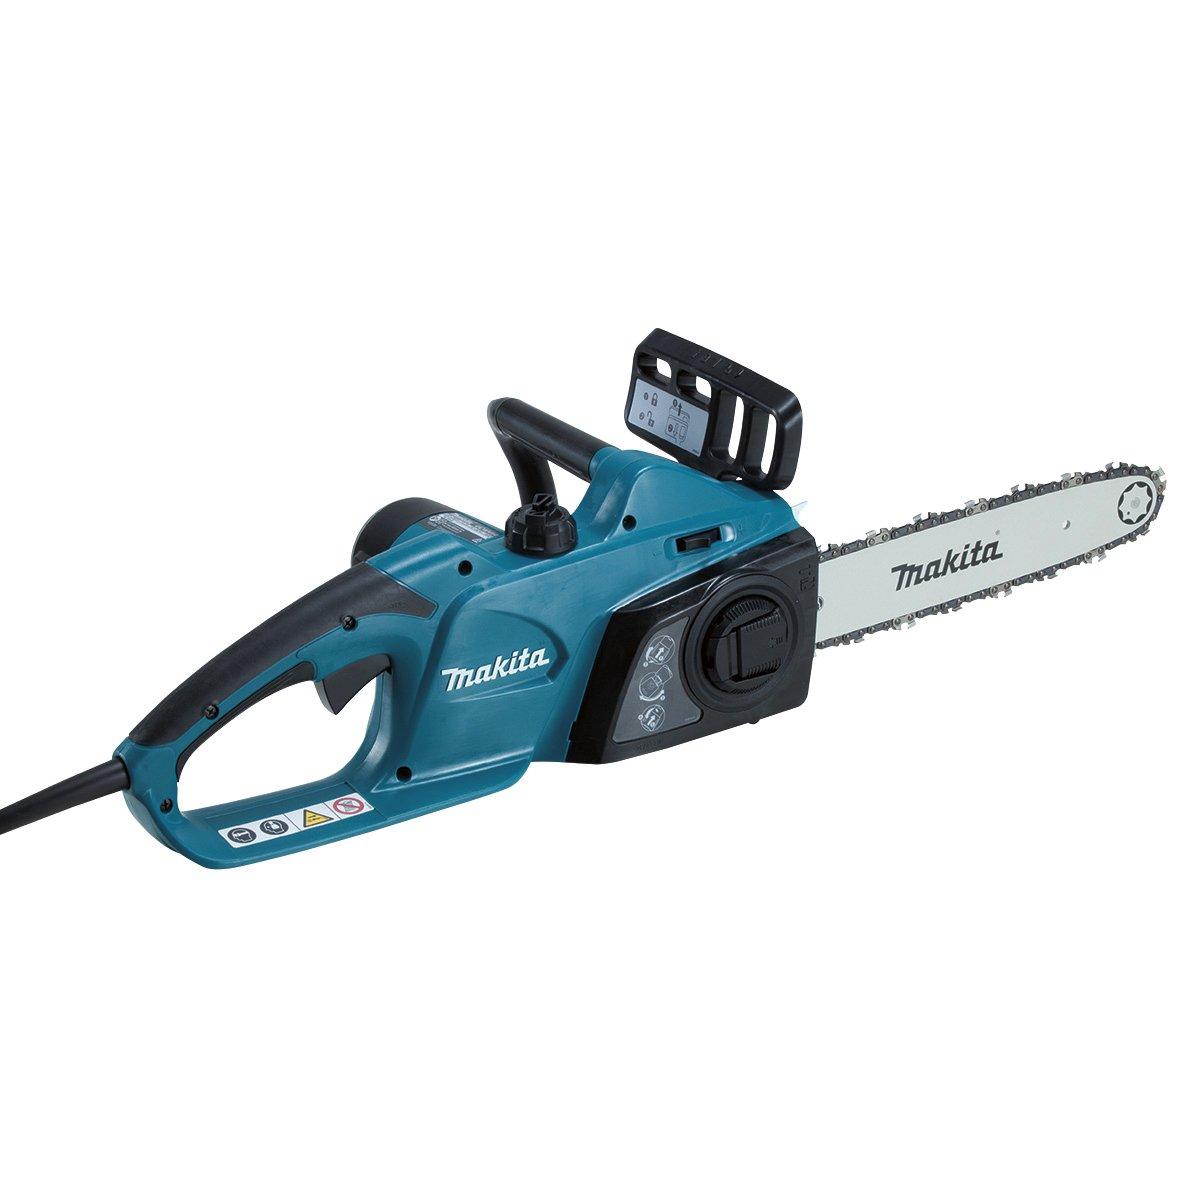 Makita UC3041A - Motosierra eléctrica 1800 W, 1800 V, Negro, Azul 30cm product